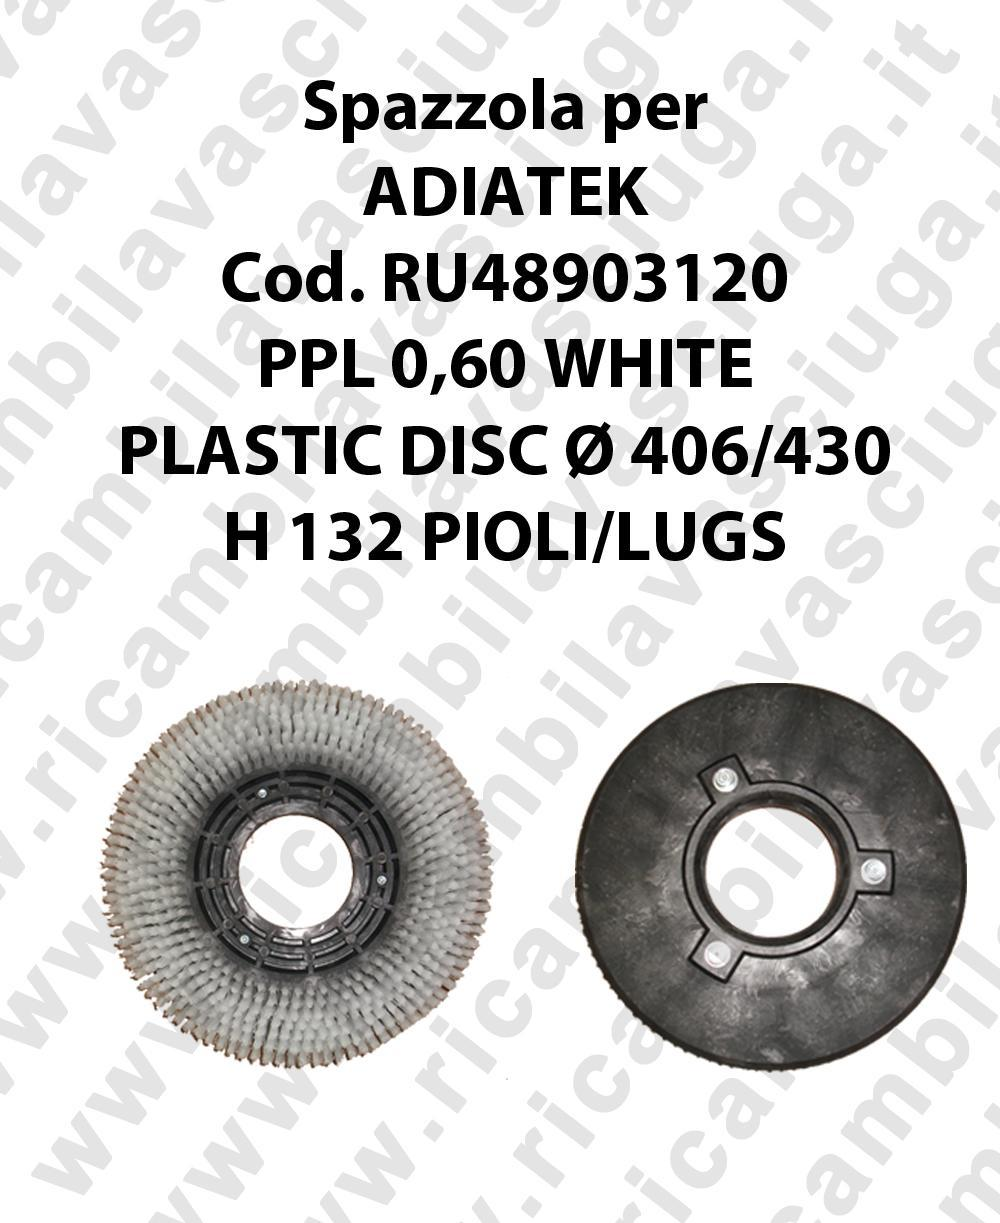 BROSSE A LAVER PPL 0,60 WHITE pour autolaveuses ADIATEK code RU48903120